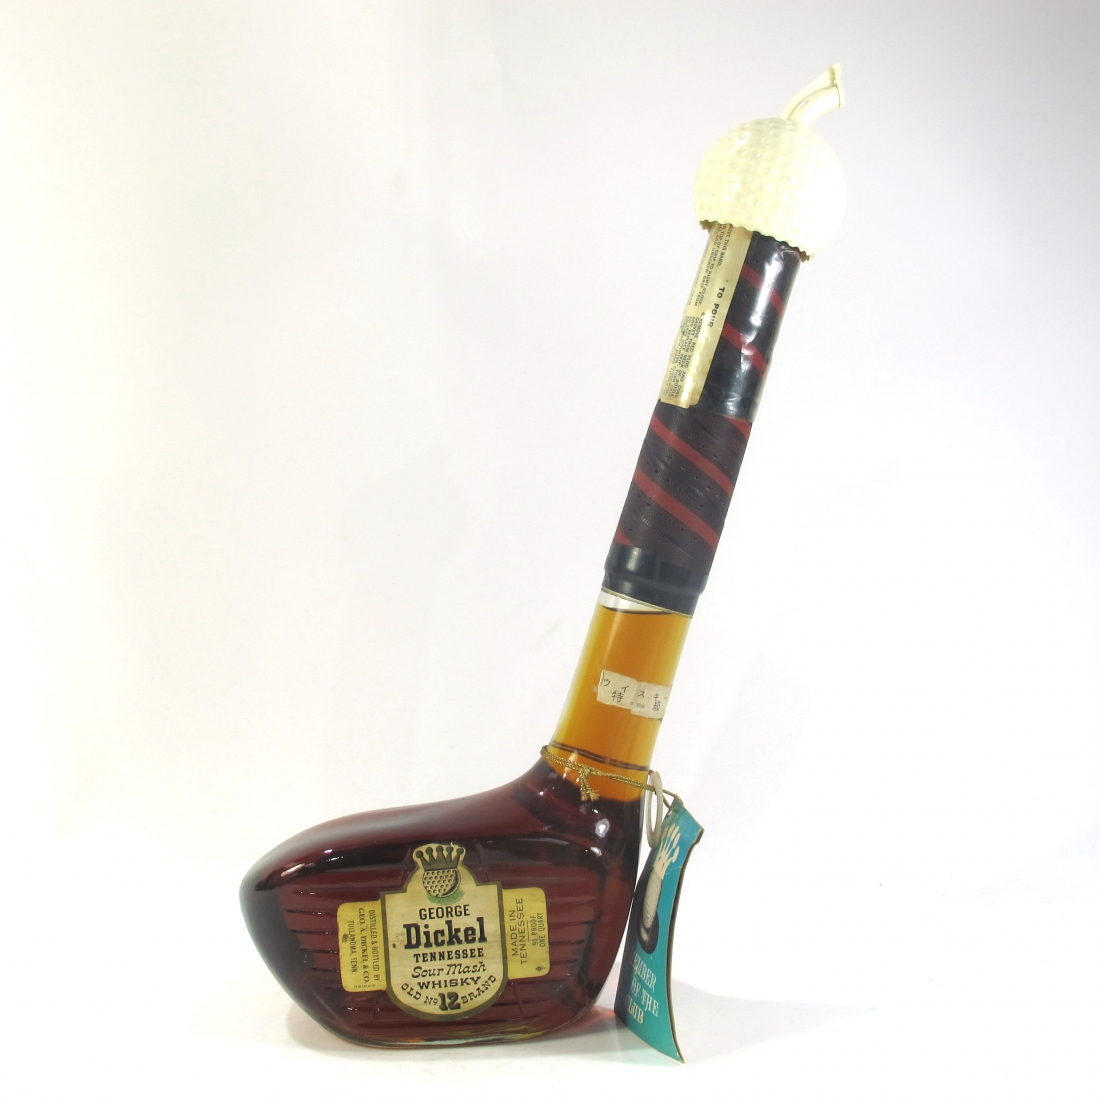 George Dickel Old No.12 Brand Golf Club Bottle 1 Quart 1960s